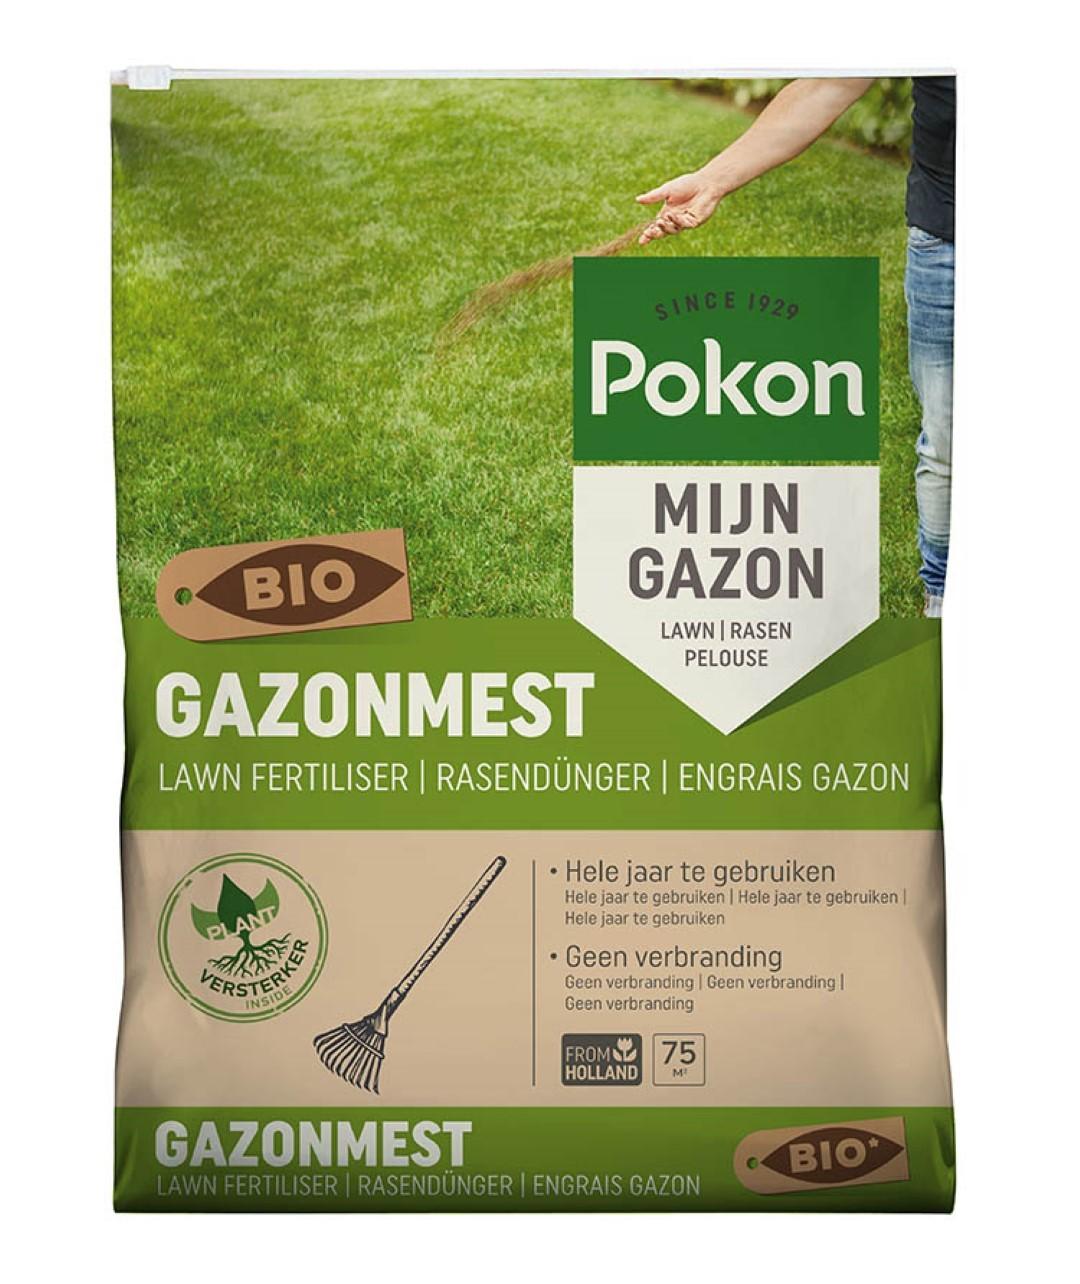 Bio Gazonmest 75m2